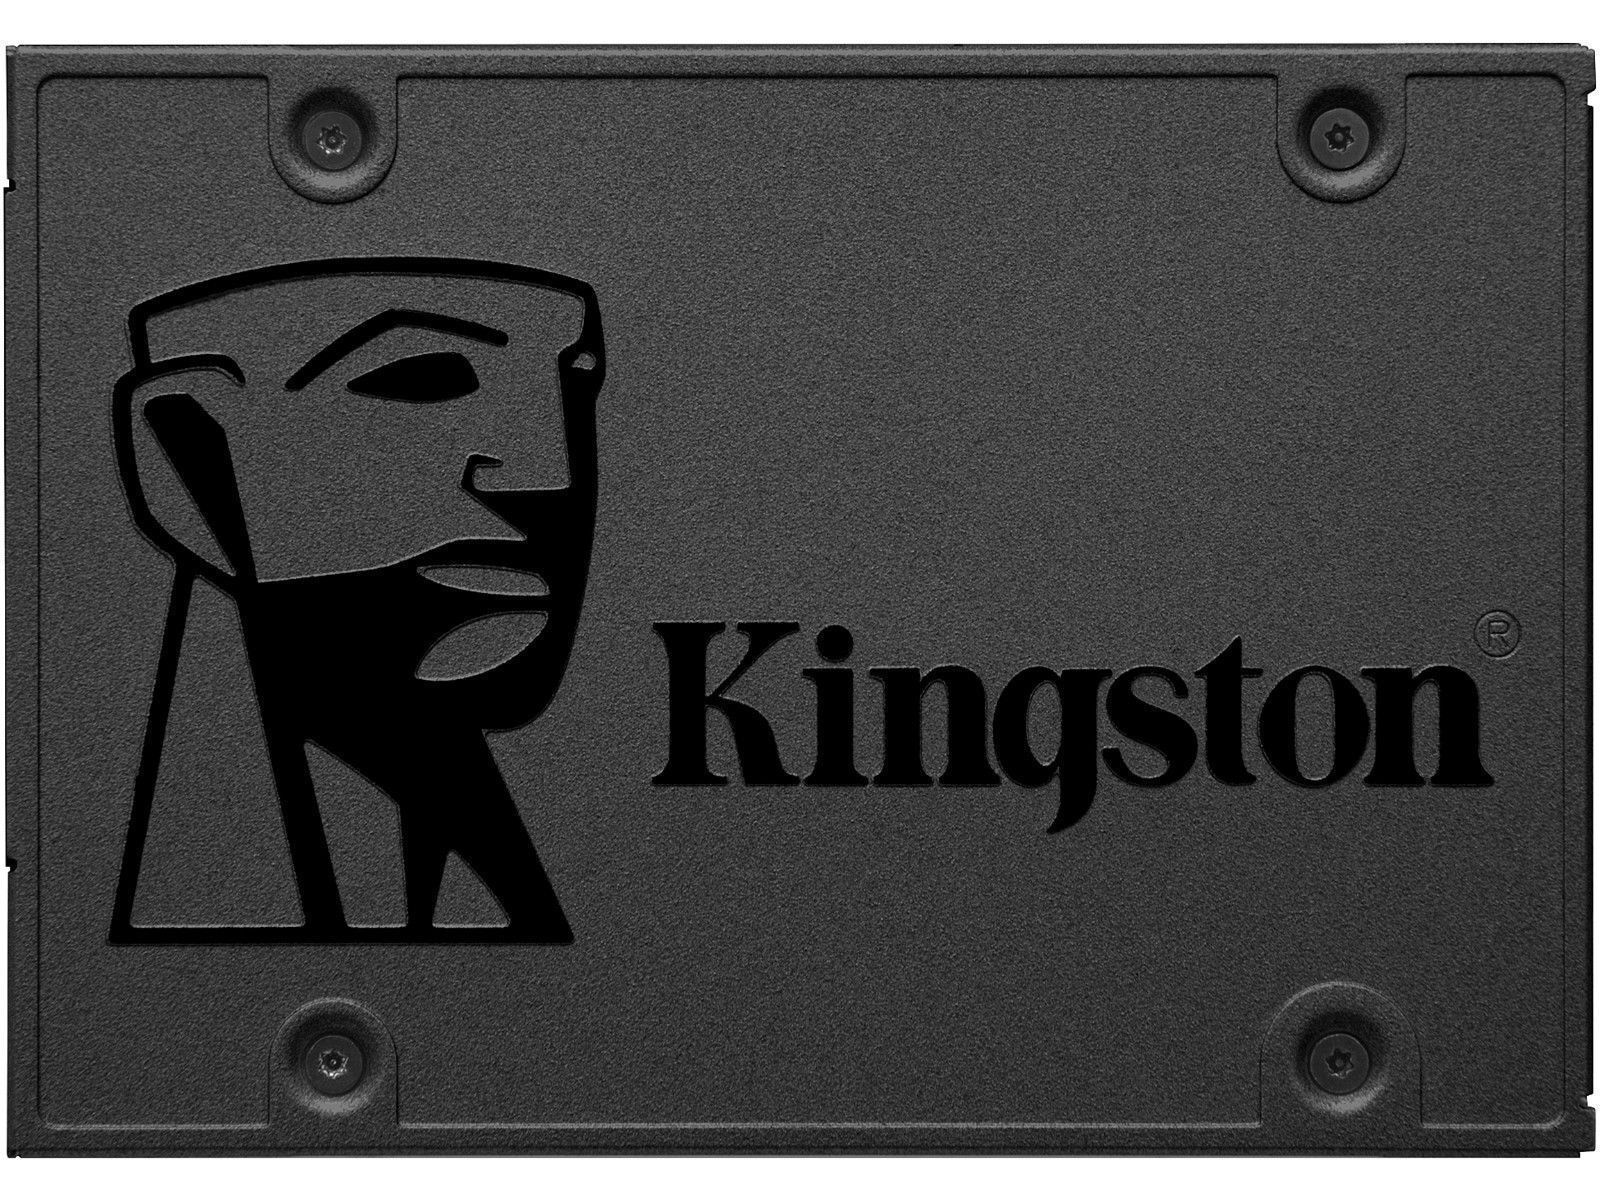 120GB Kingston A400 SSD SATA III 2.5 Internal Solid State Drive SA400S37120GB